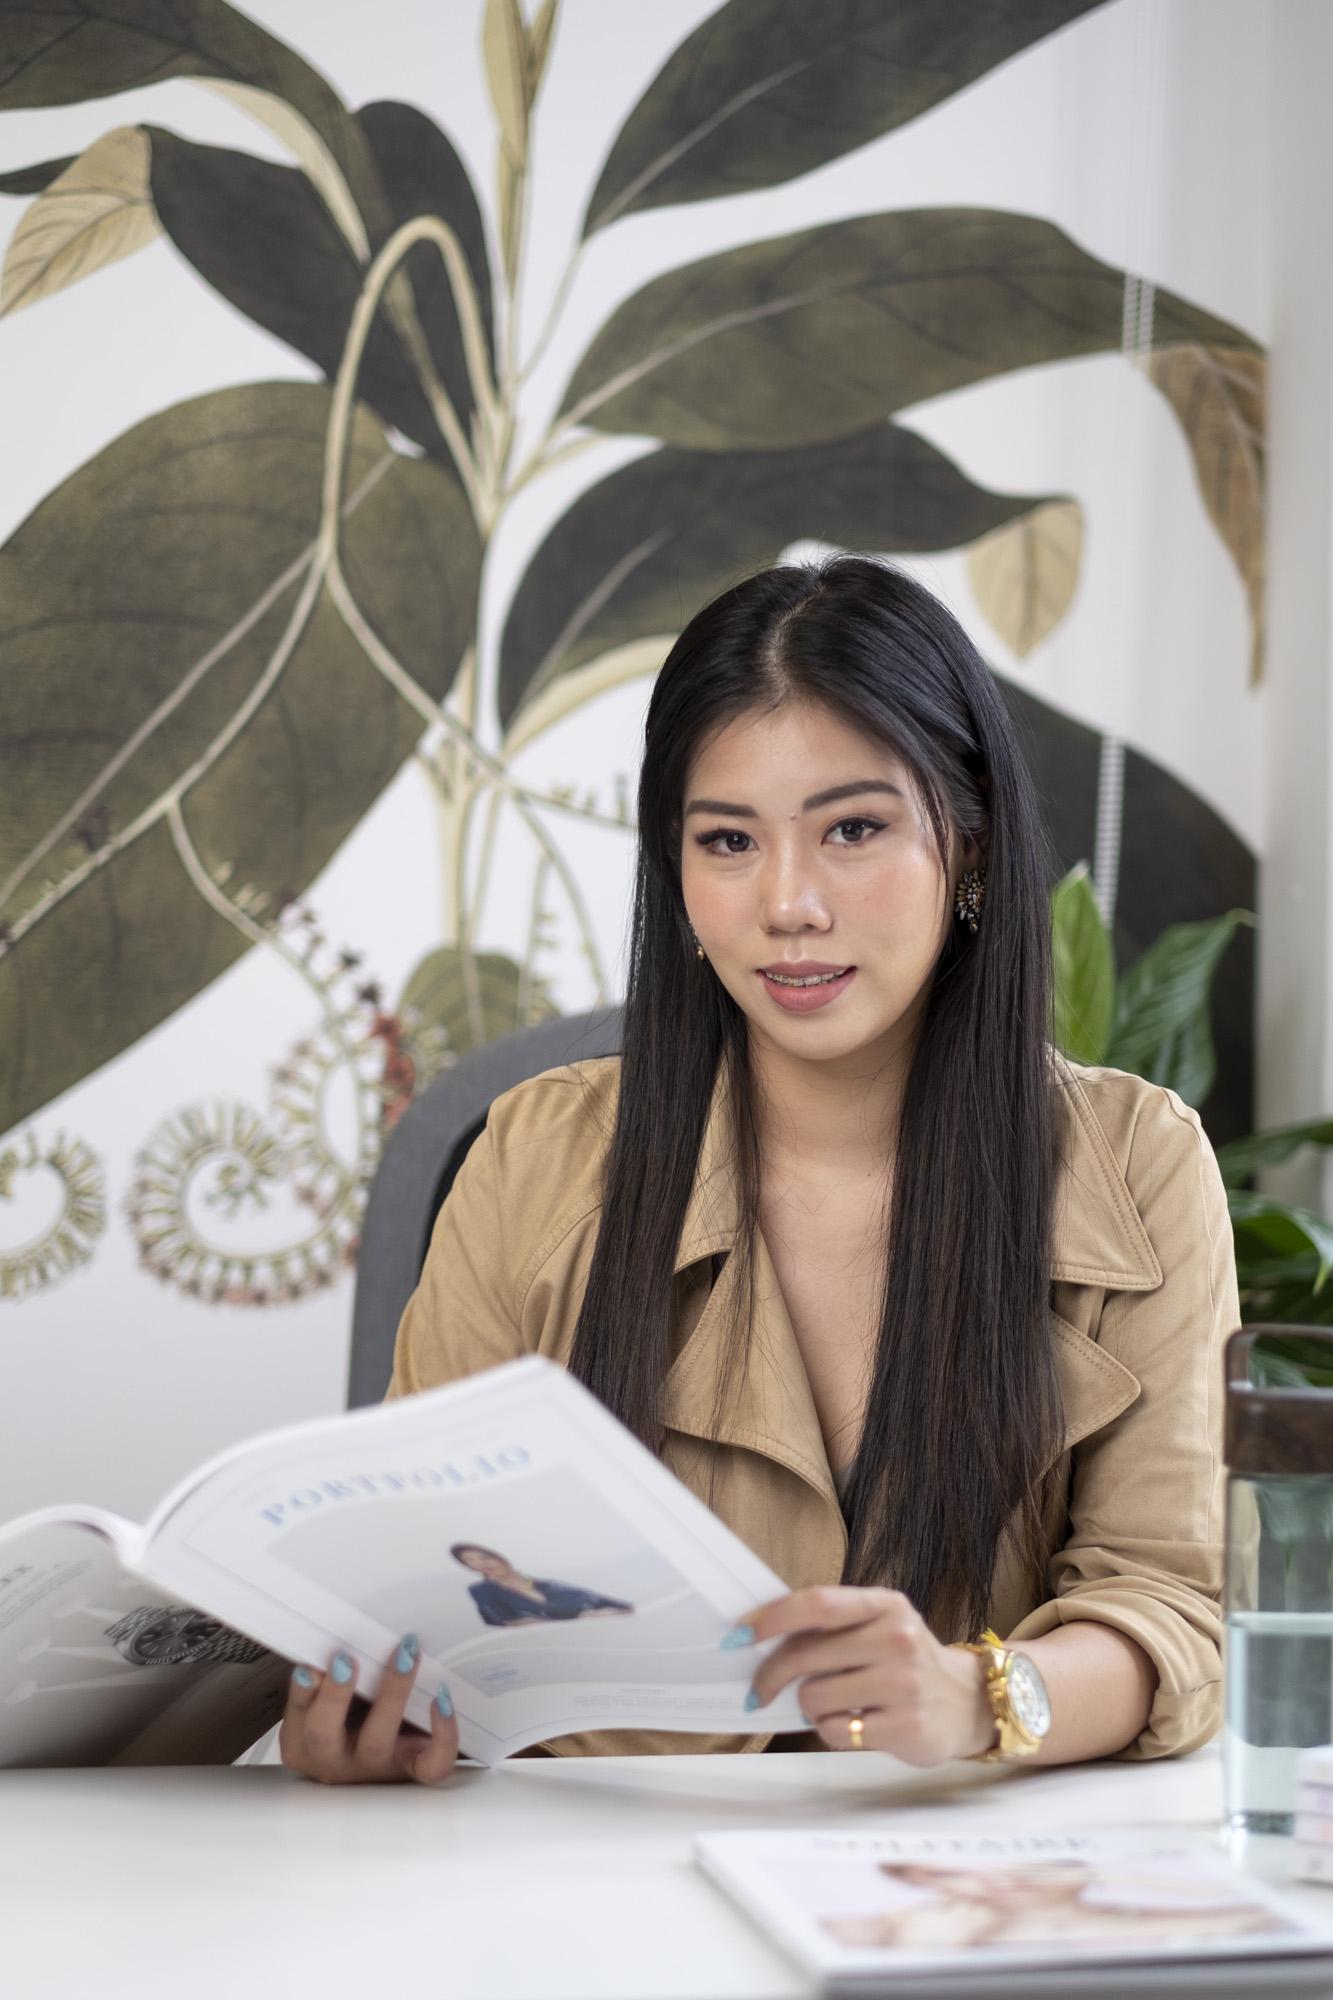 Corporate headshot portrait linkedin profil photography studio singapore services asia photographer coco pr agency team agnes